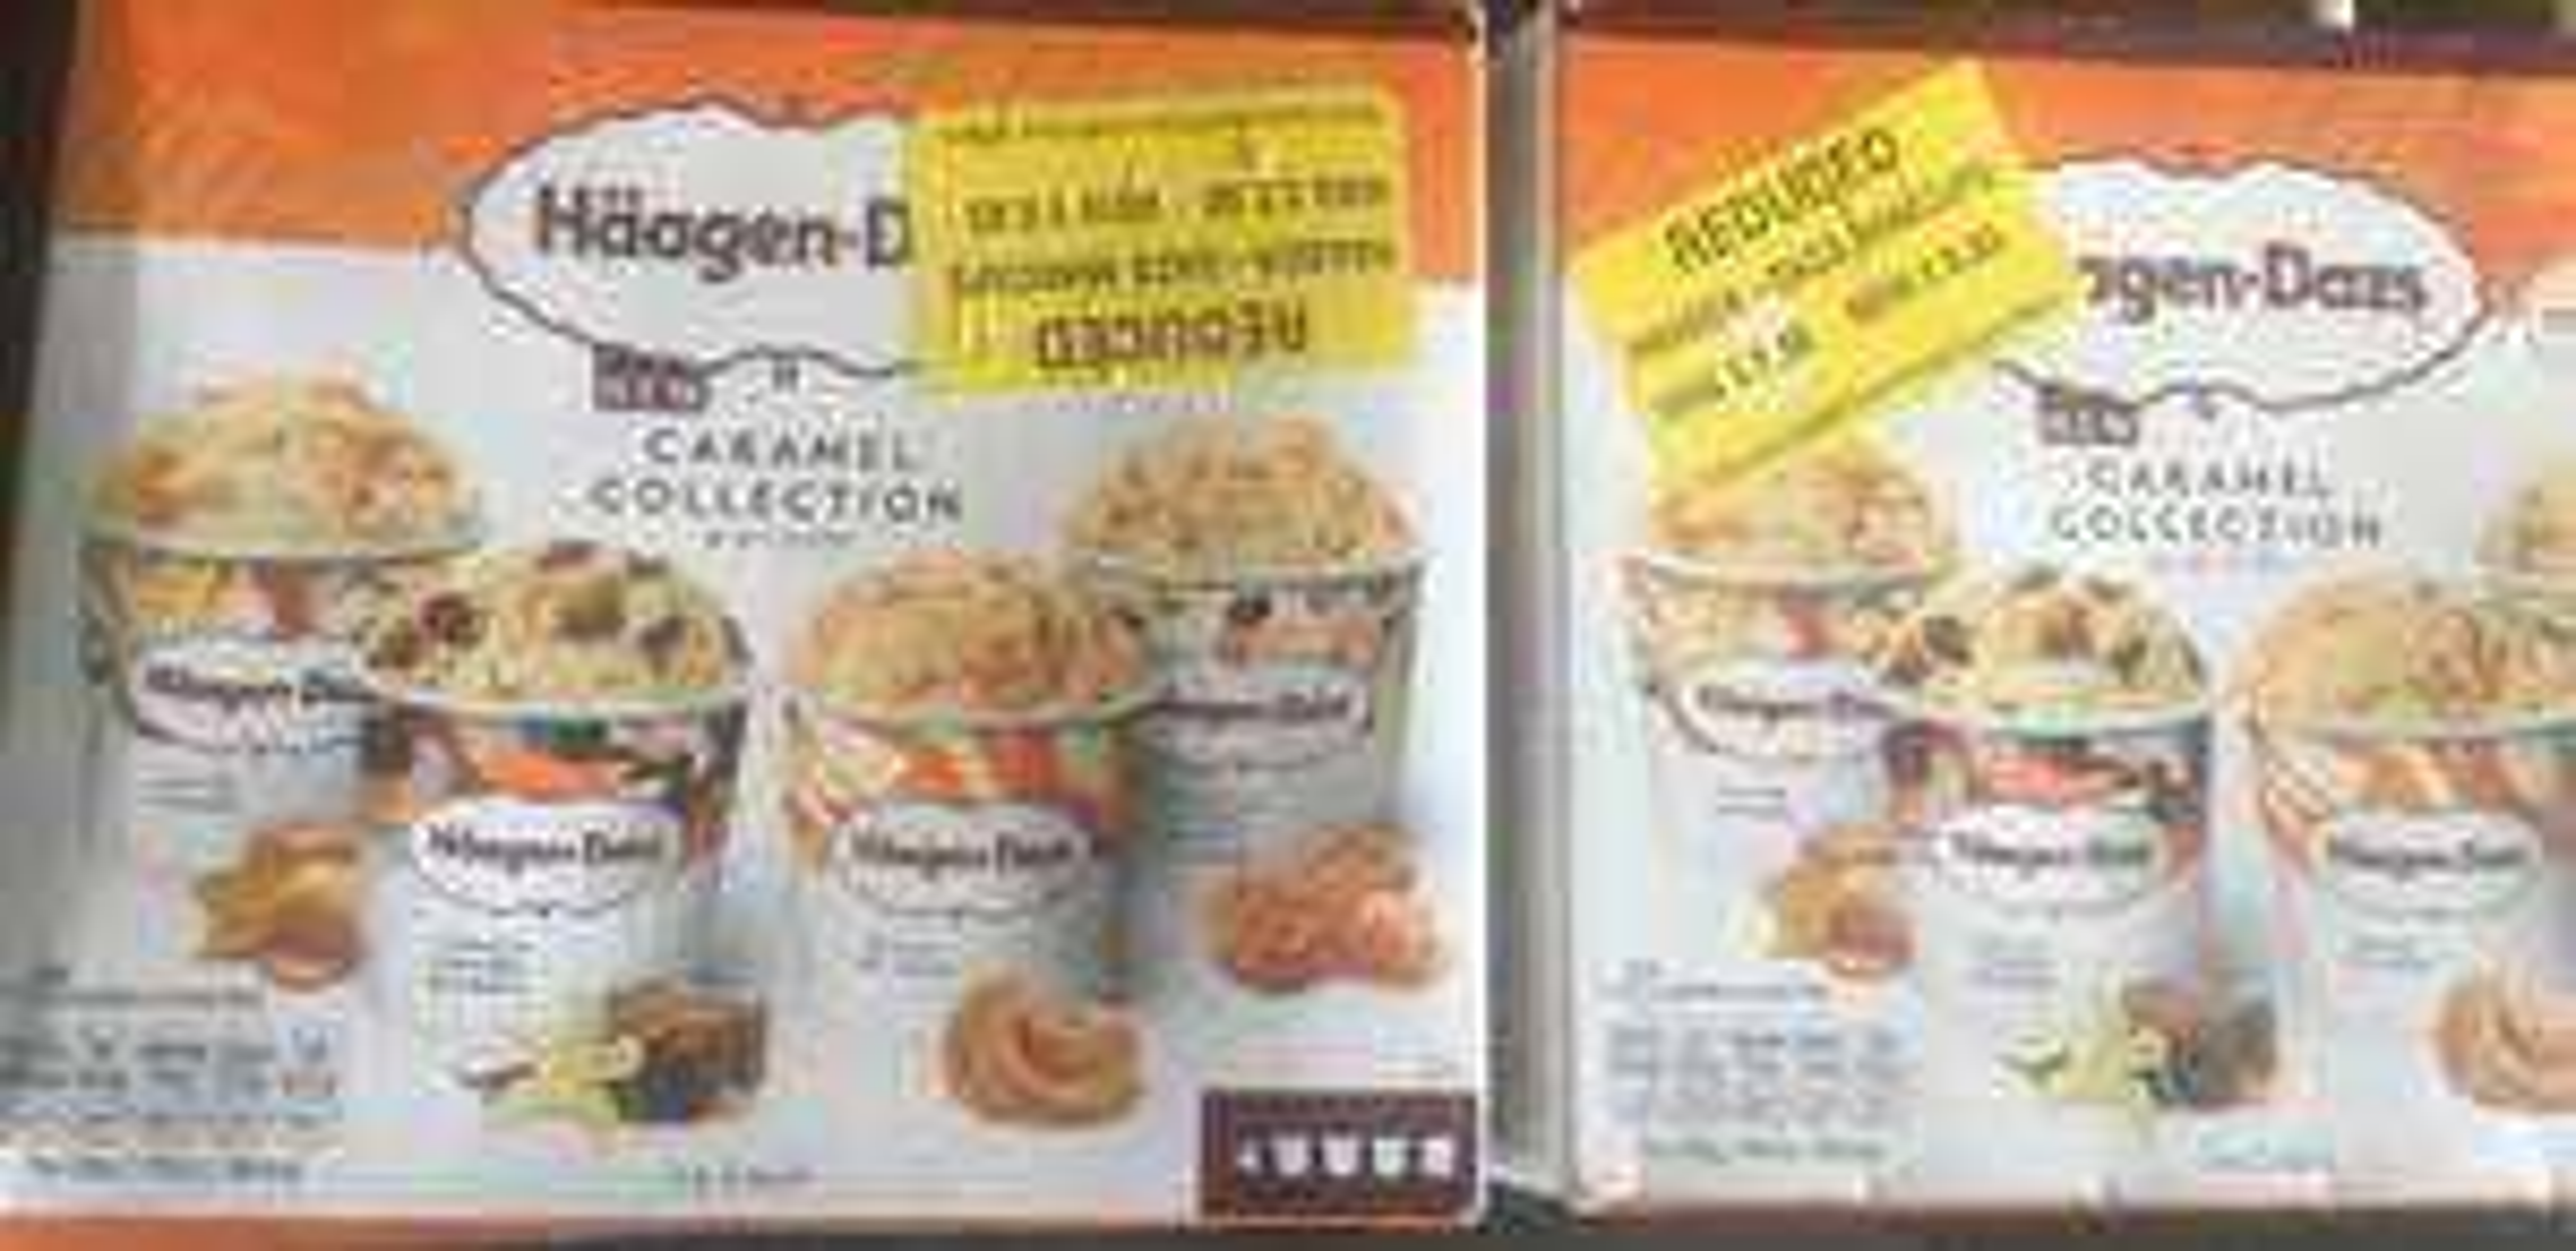 Haagan-dazs mini cups caramel collection £0.63p at morrisons